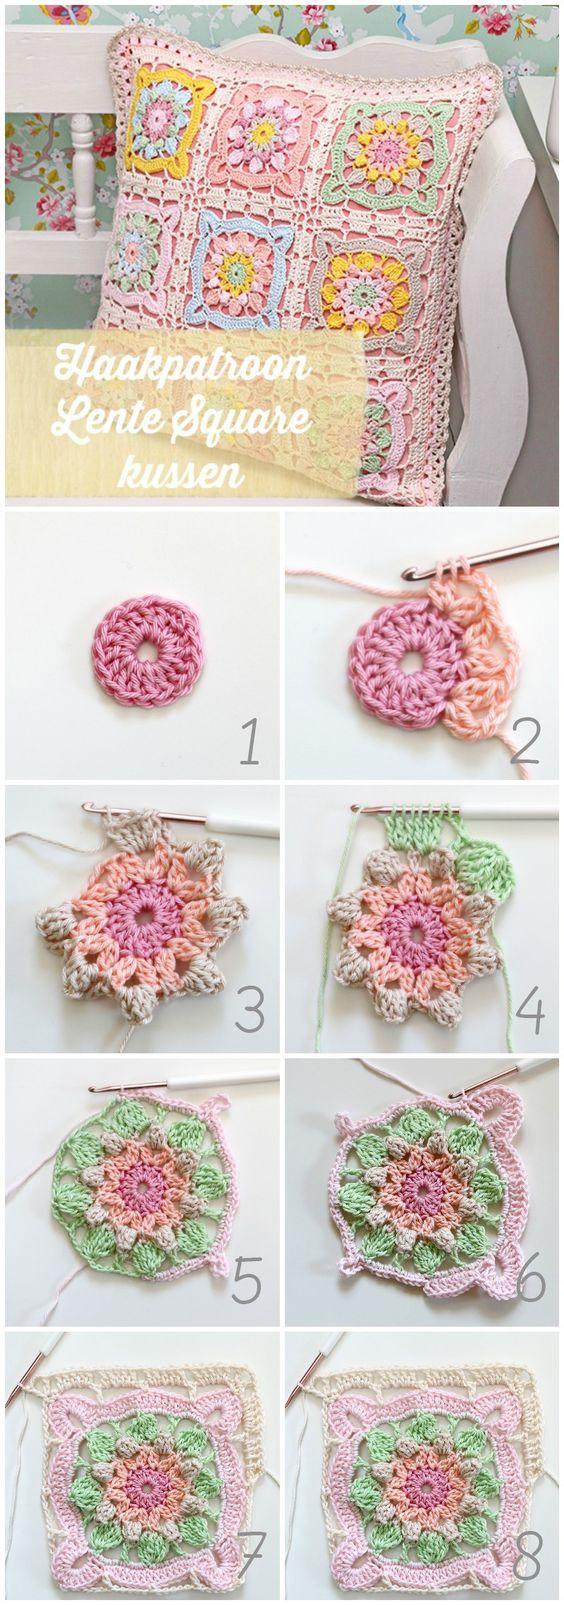 Spring square cushion  Free crochet pattern Lente square kussen  Gratis haakpatroon: